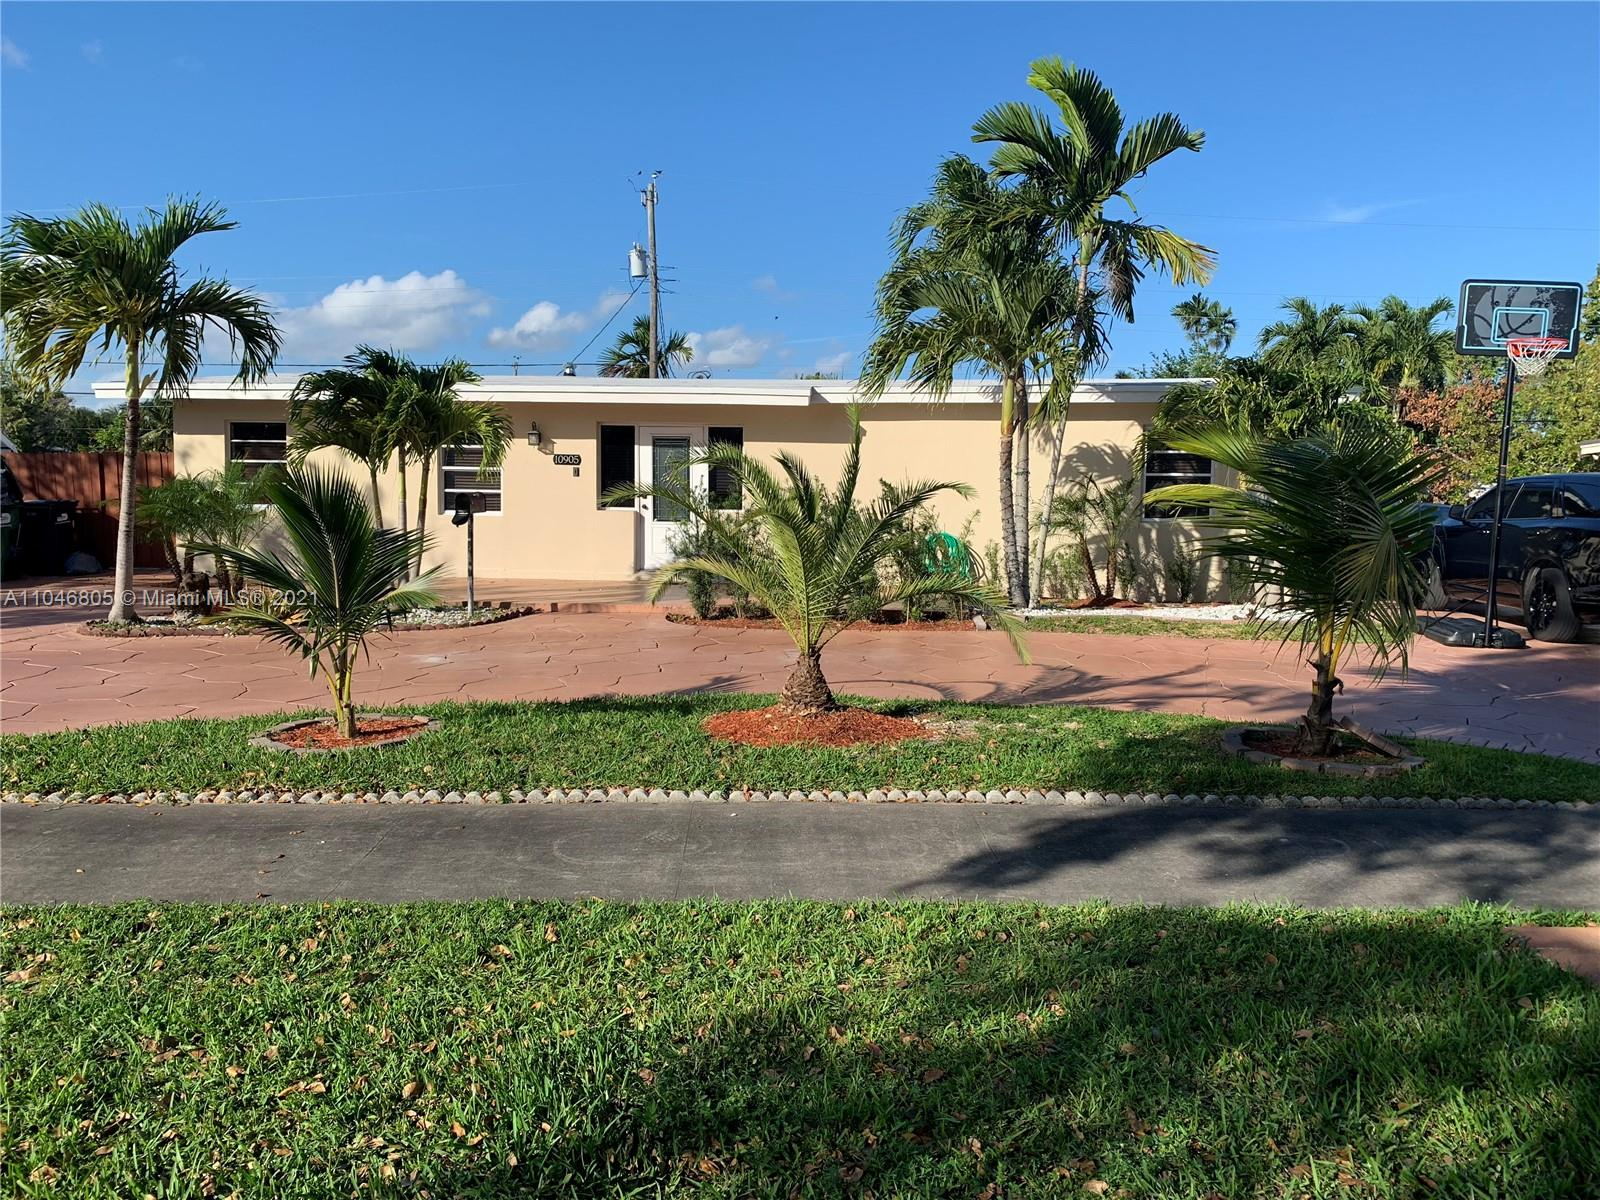 Westwood Lake - 10905 SW 52nd Dr, Miami, FL 33165